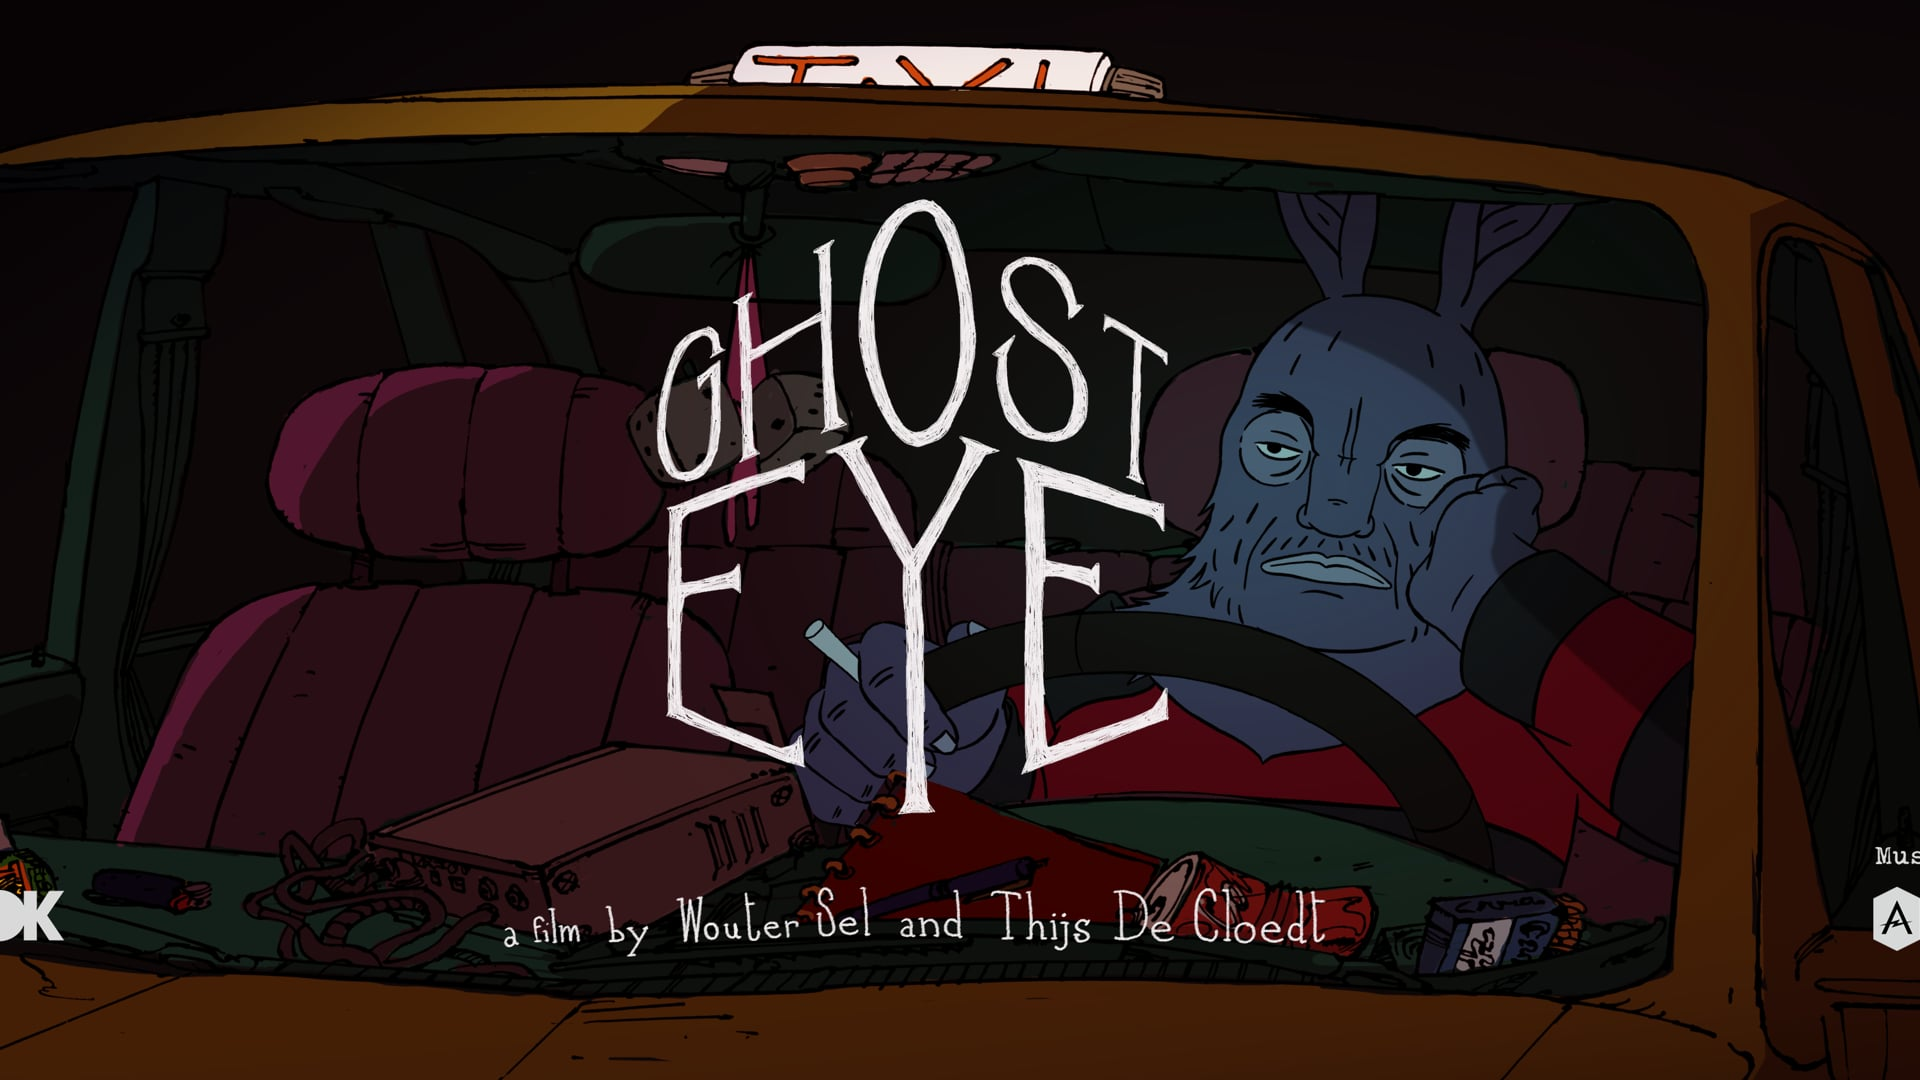 Ghost Eye